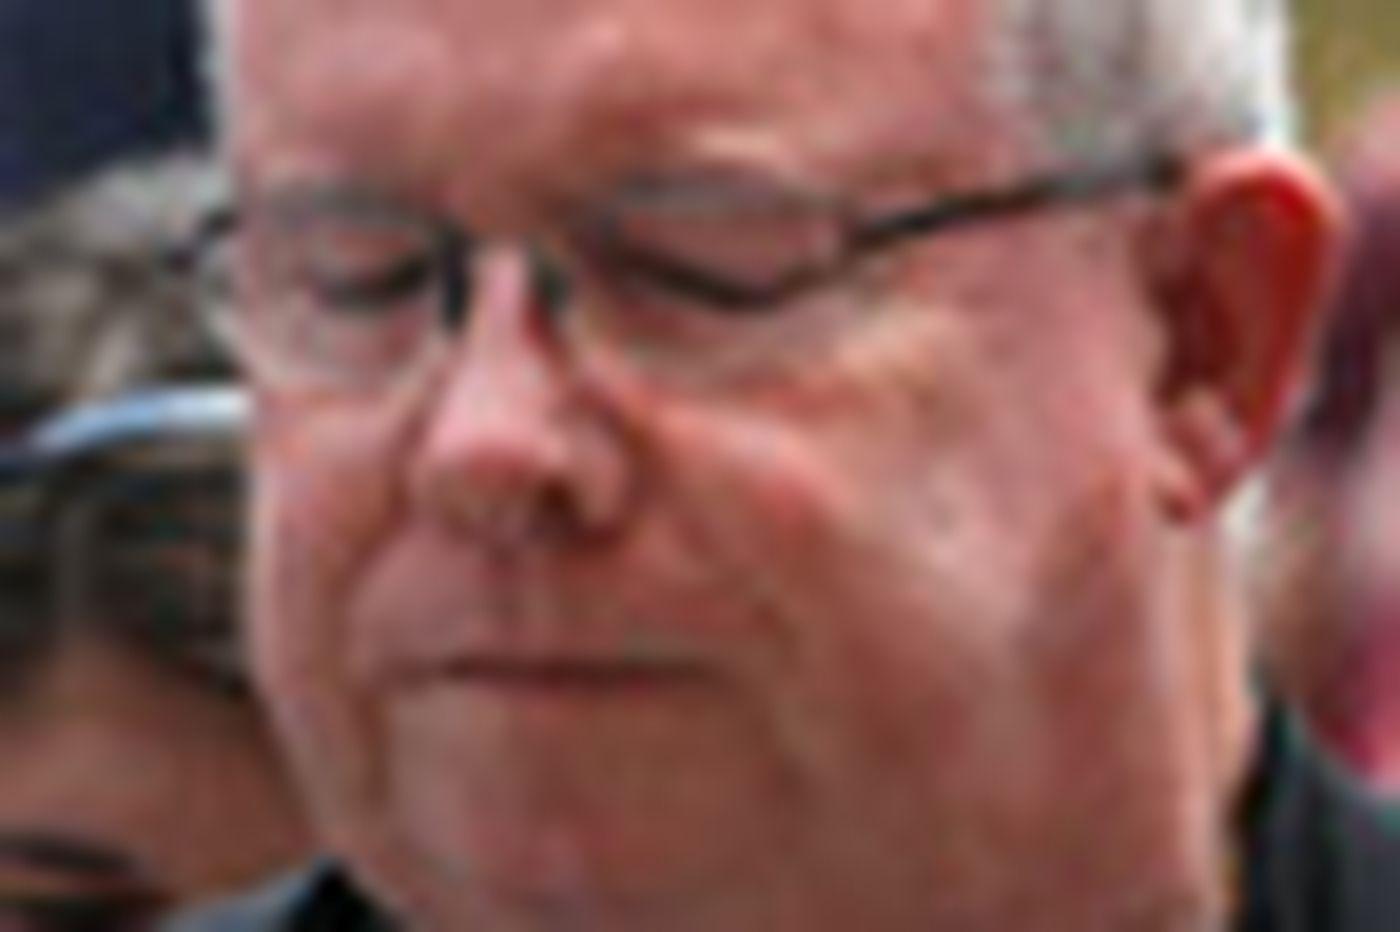 Lynn gets prison sentence of three to six years